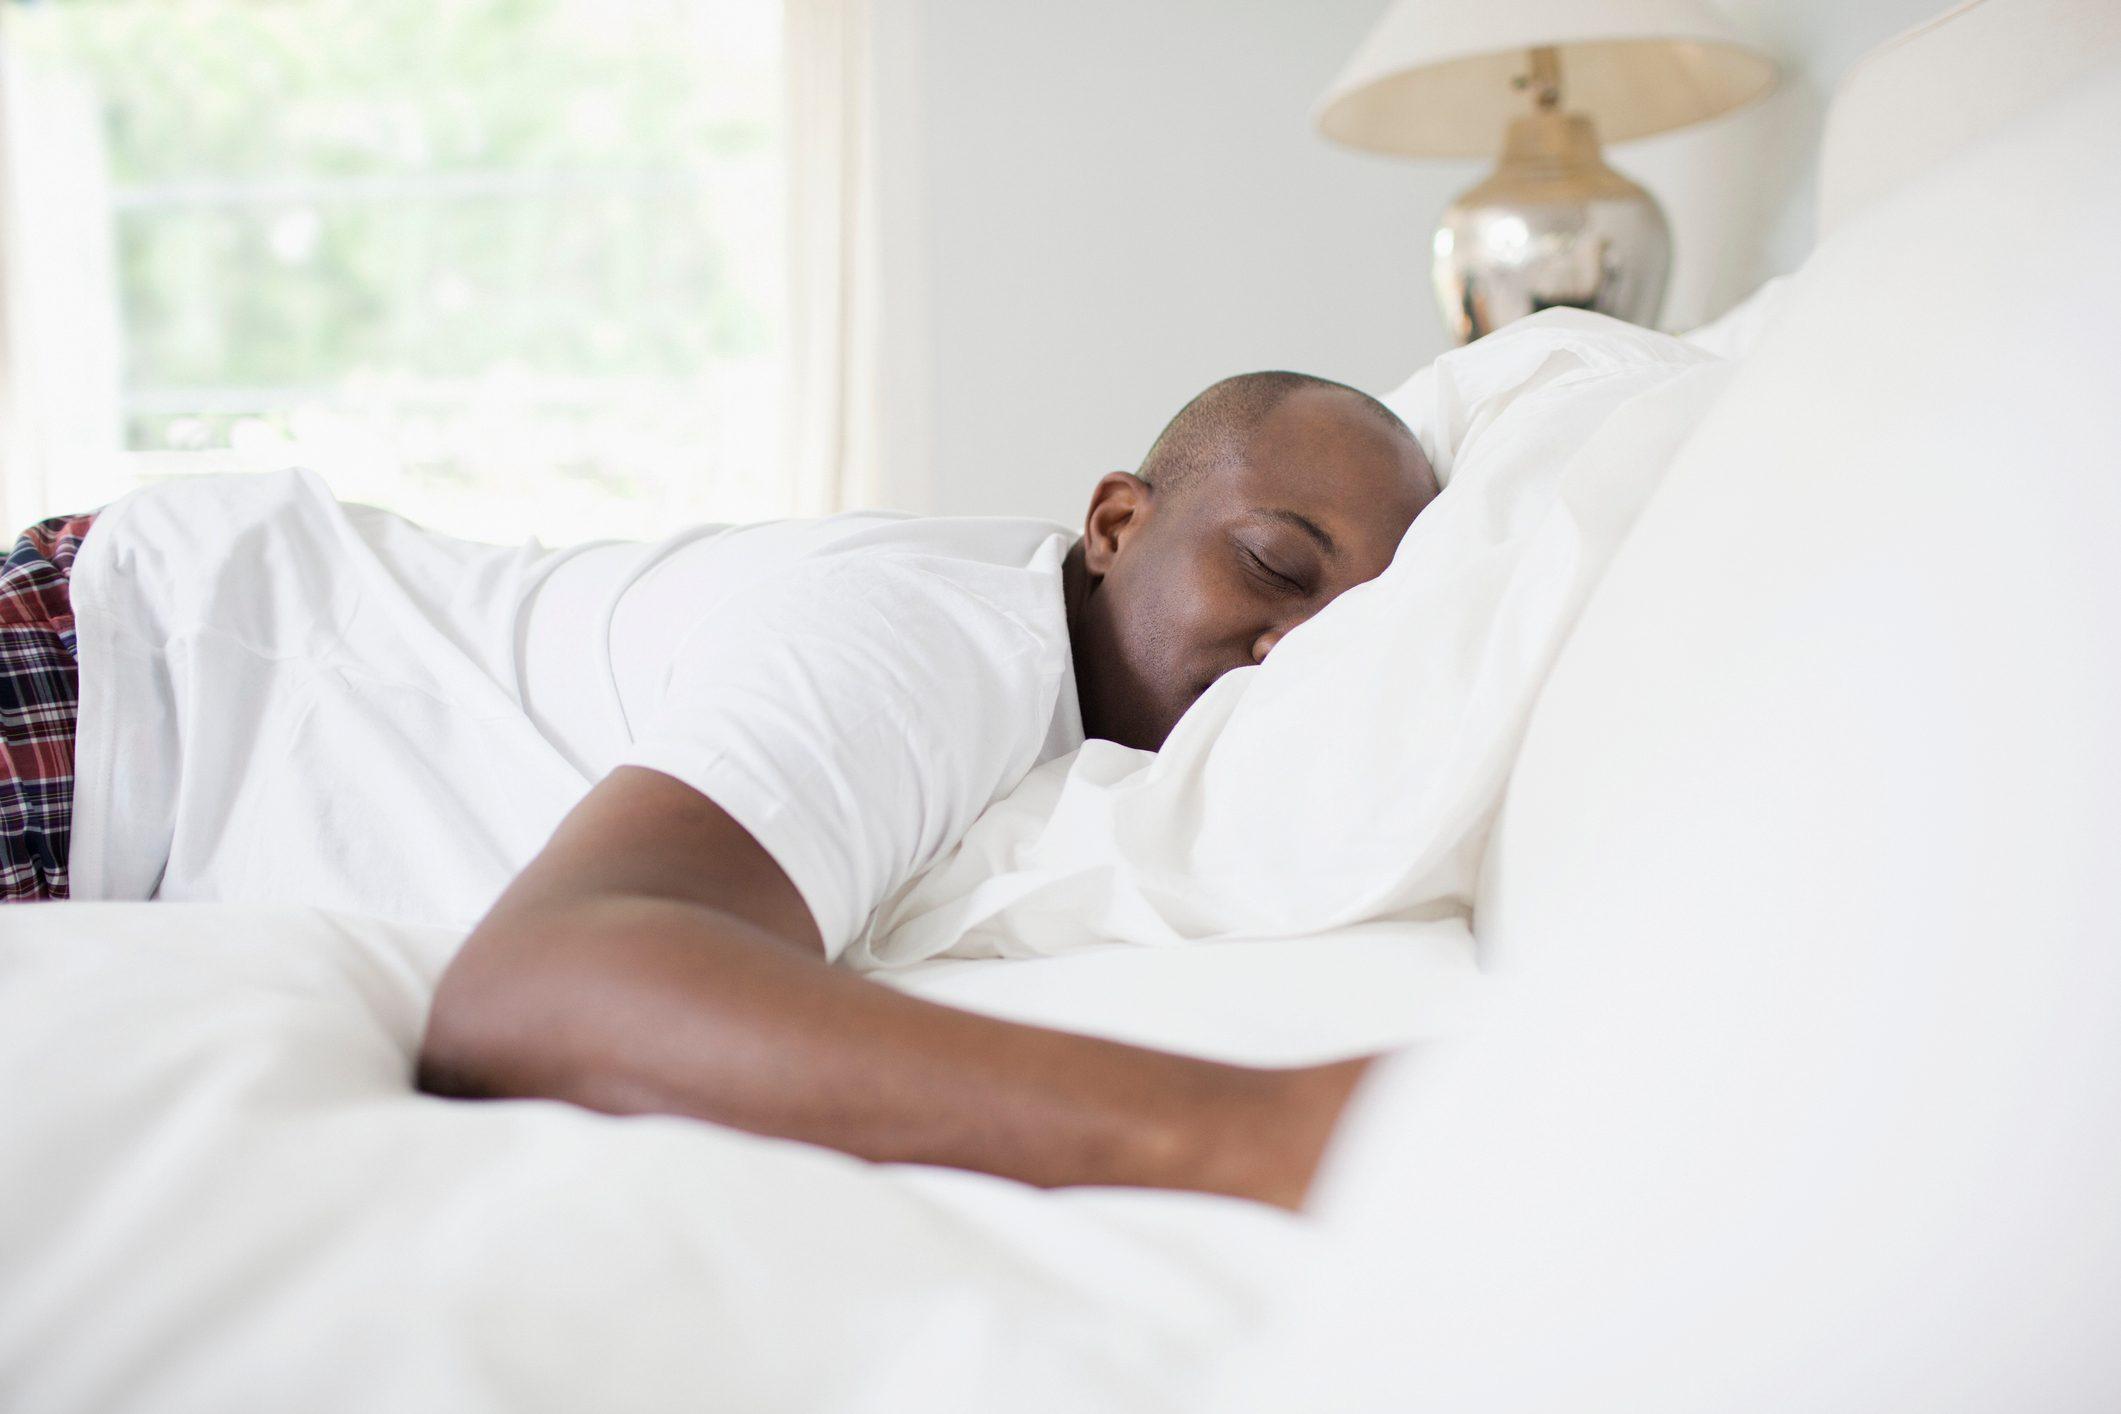 Man asleep in bedroom